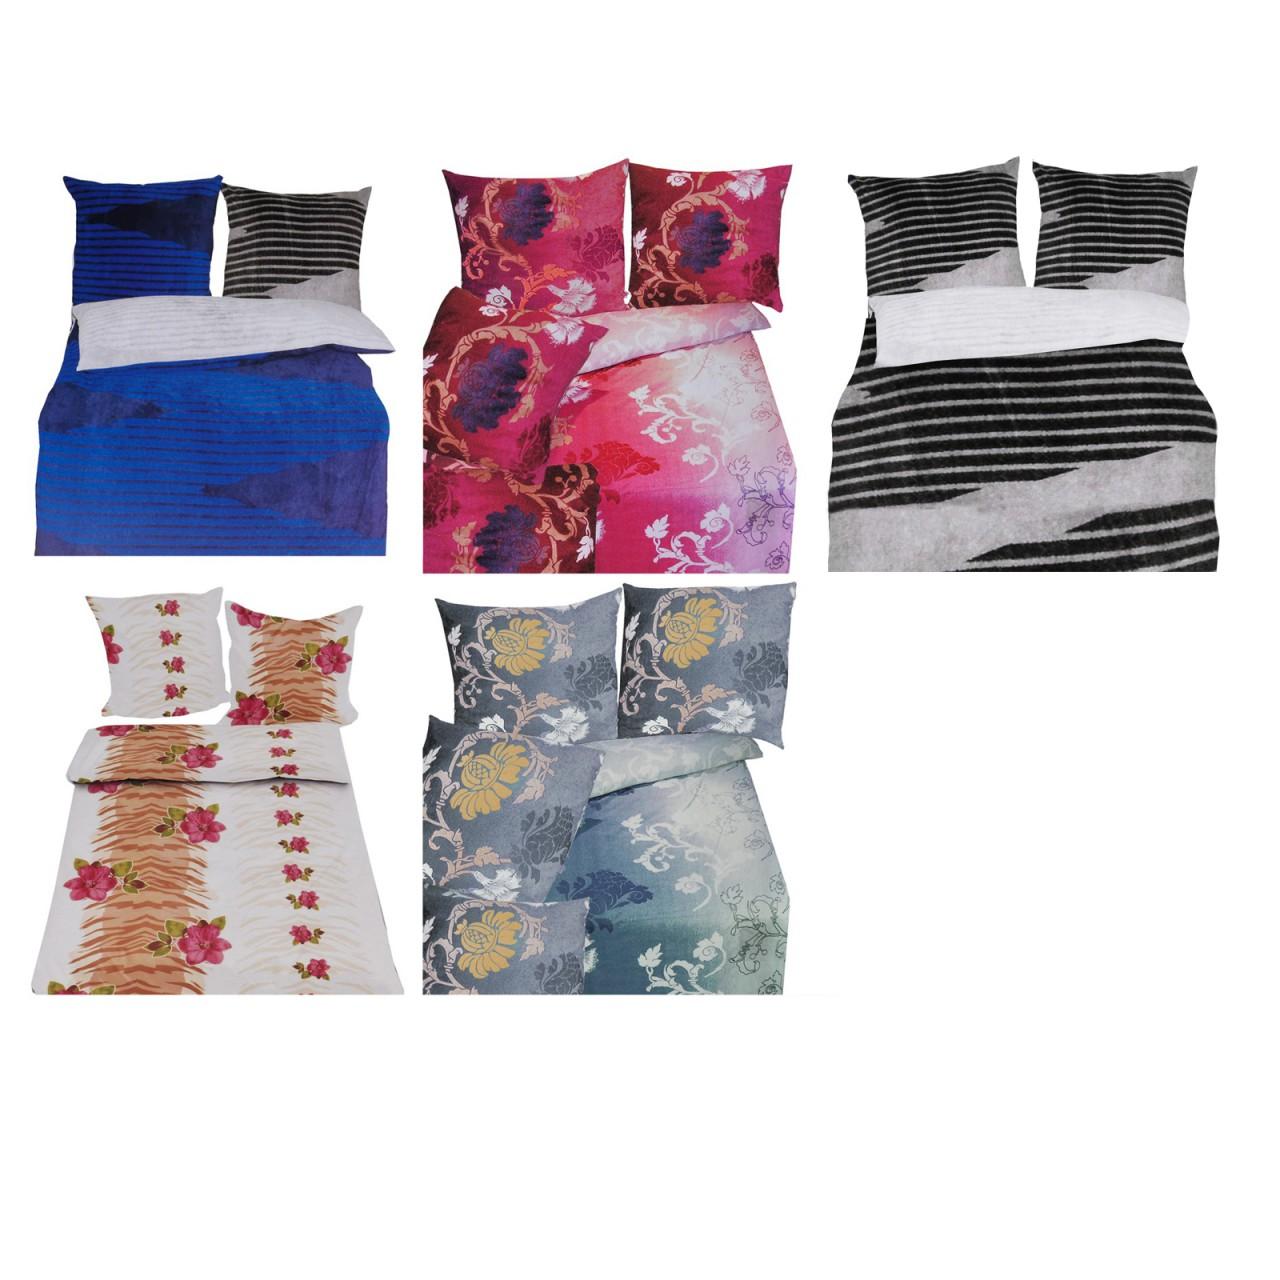 Edle Microfaser Fleece Bettwasche Set 2 Teilig Verschiedene Designs